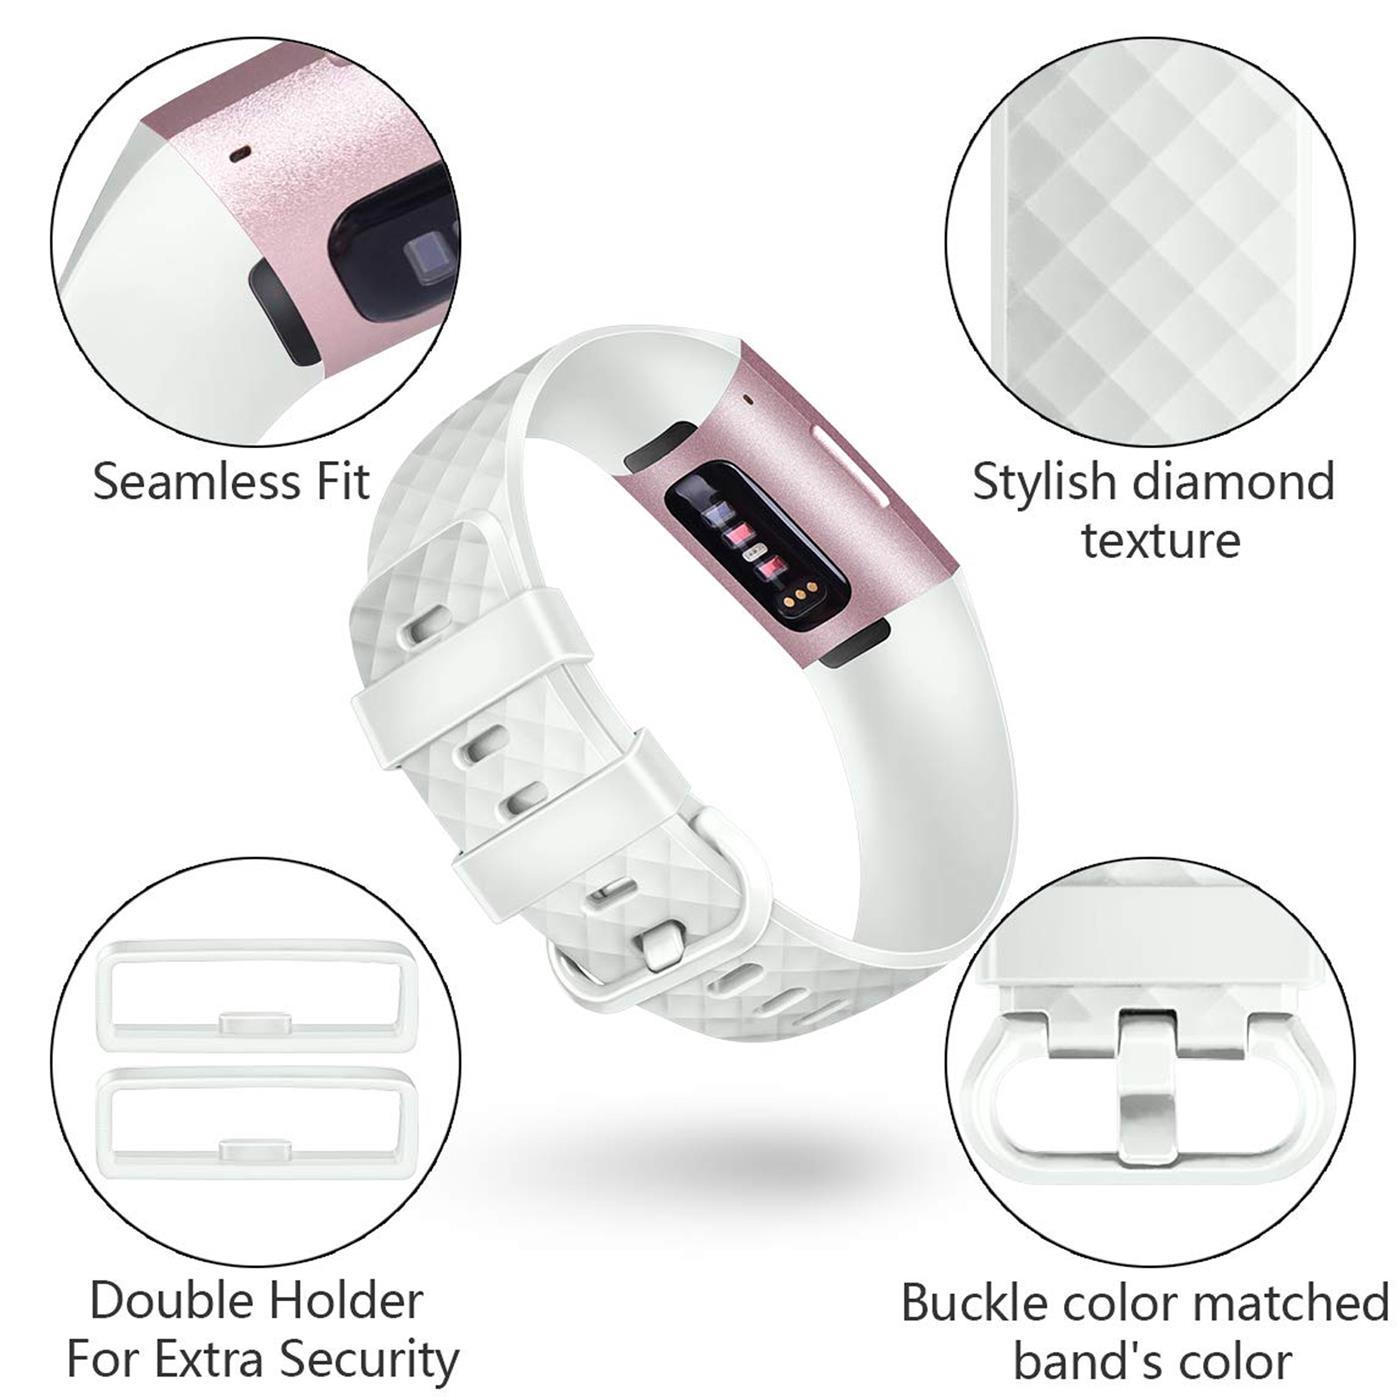 Fitbit-Groesse-S-oder-L-Ersatz-Silikon-Armband-Uhren-Sport-Band-Fitness-Tracker Indexbild 25